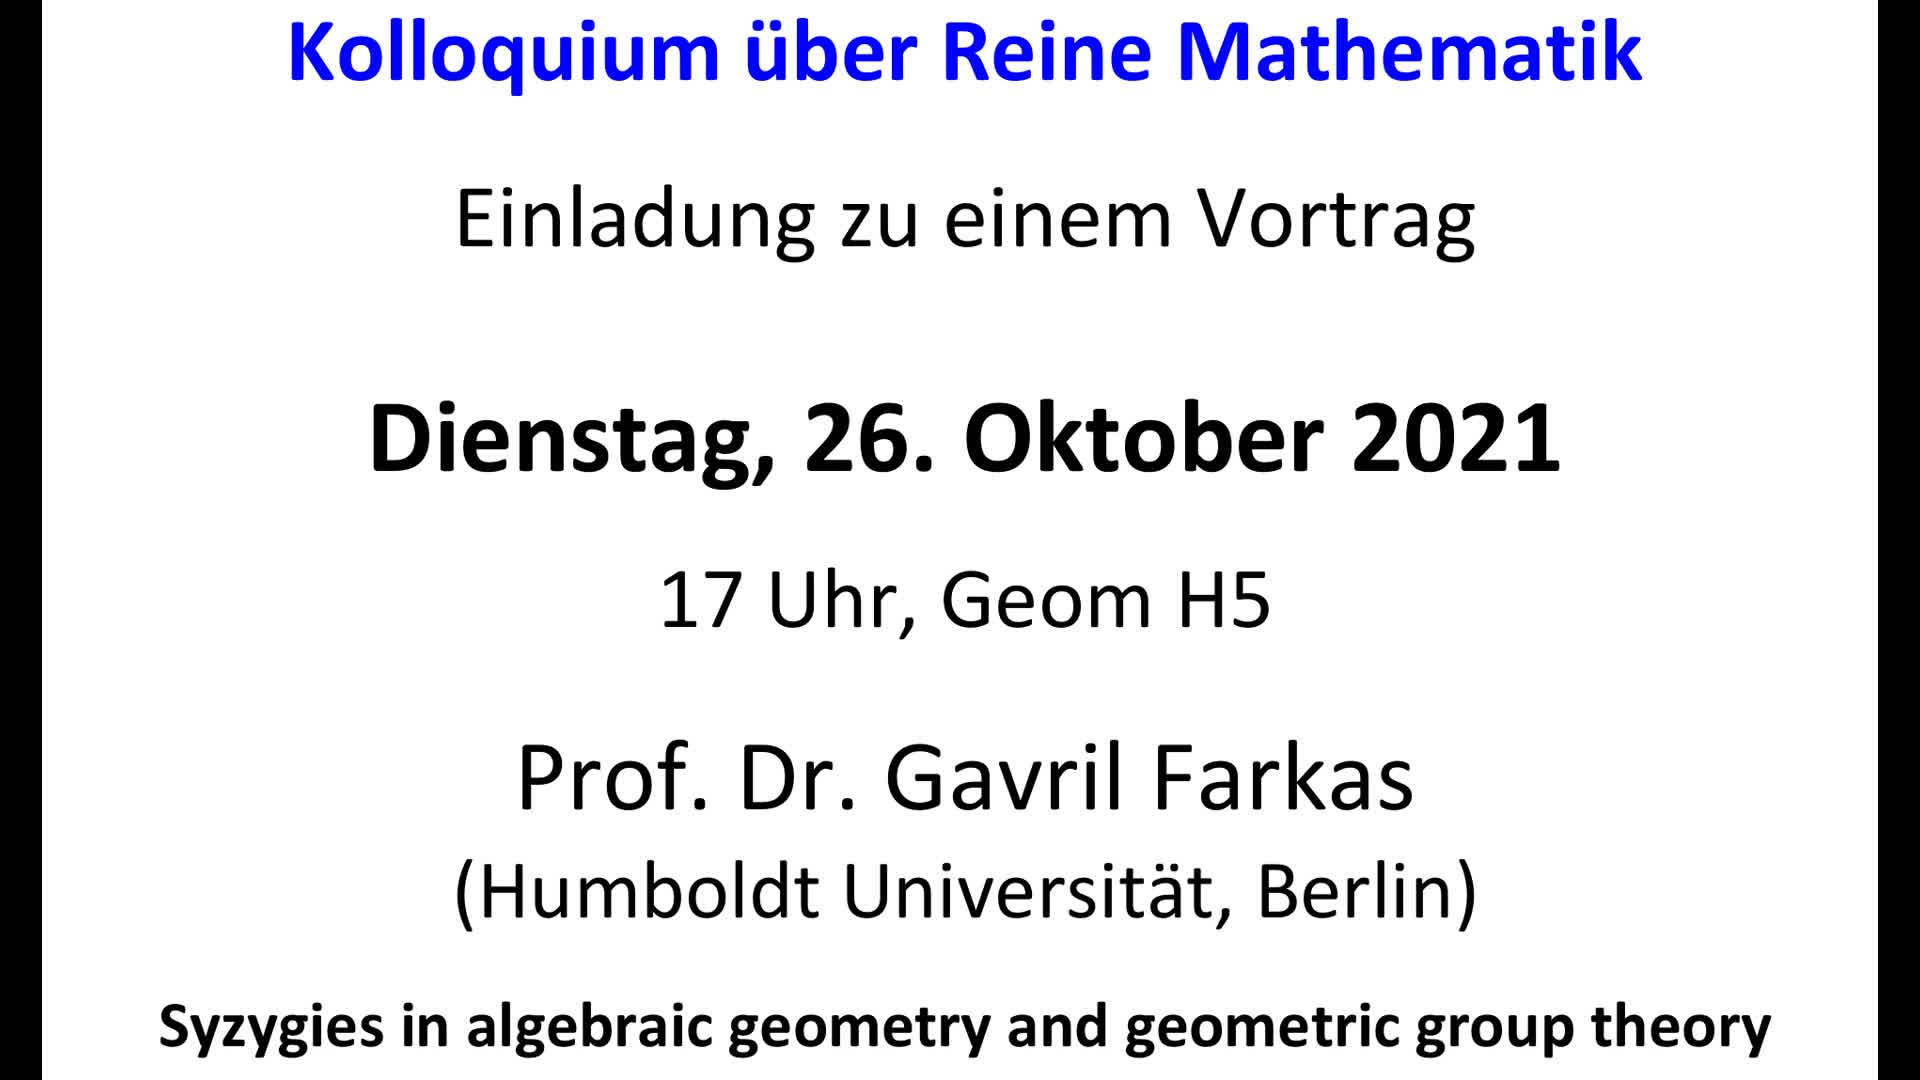 Thumbnail - Syzygies in algebraic geometry and geometric group theory